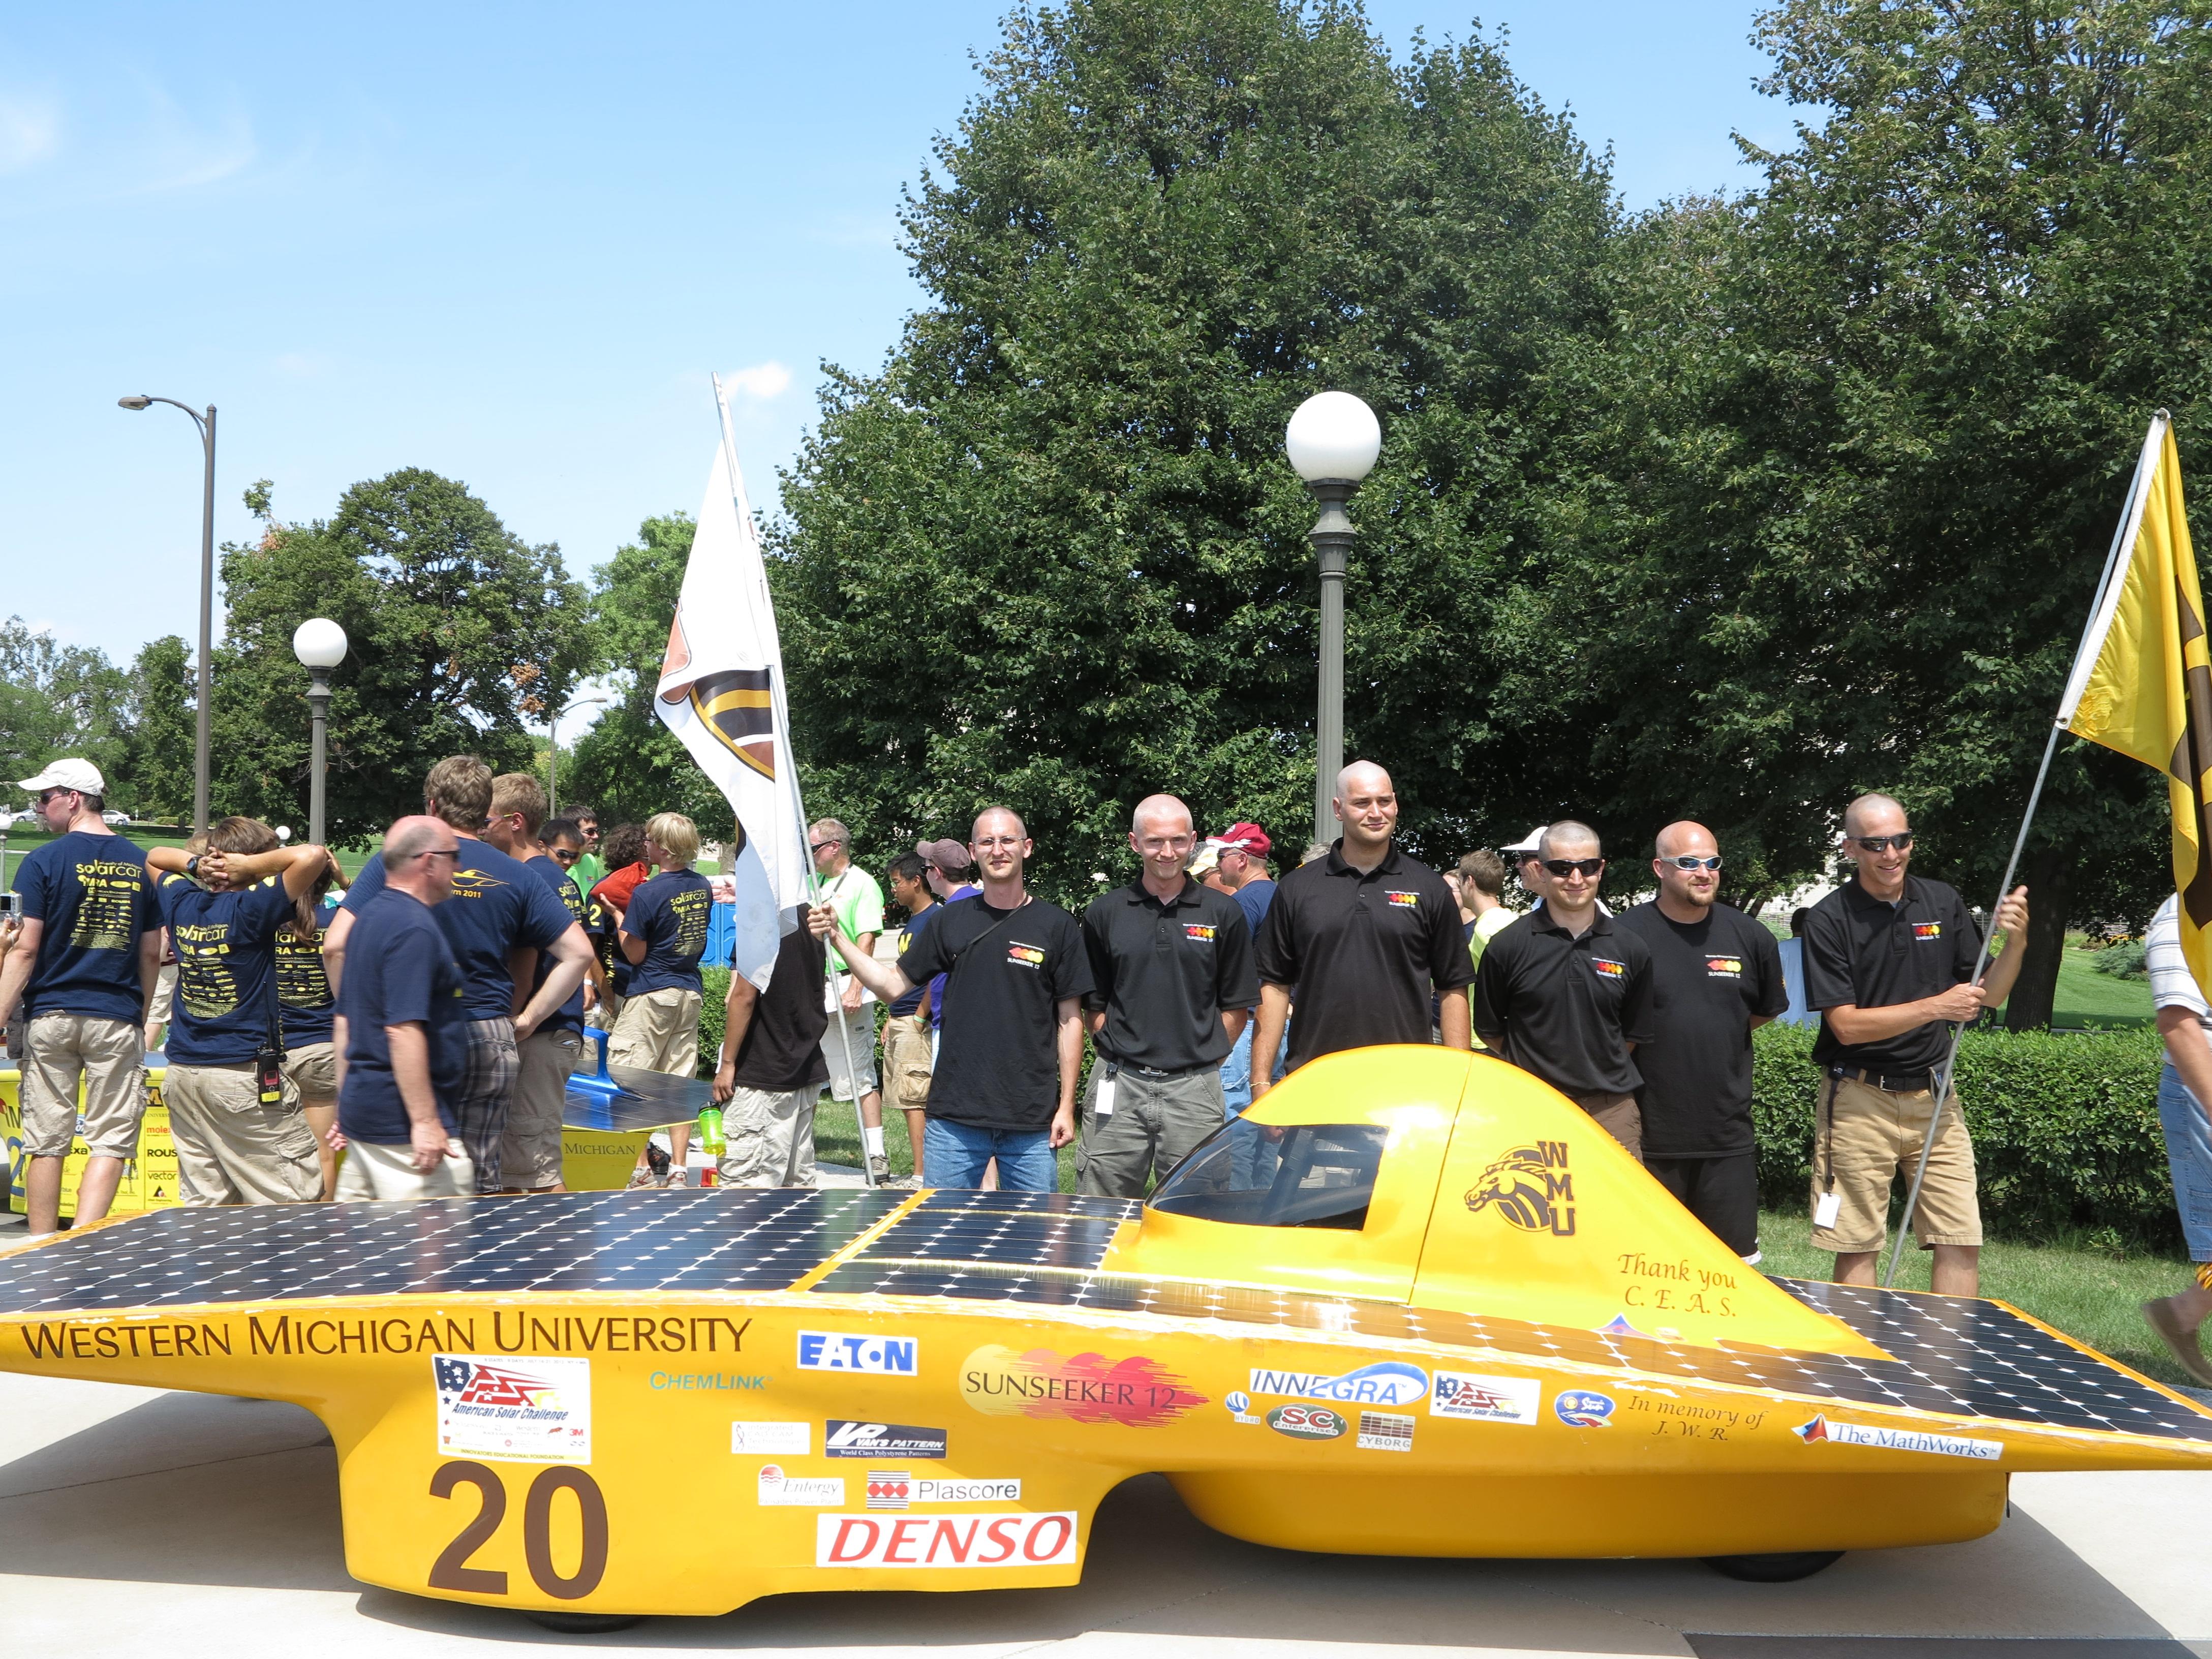 ASC2012 Western Michigan Univ  w team members 1